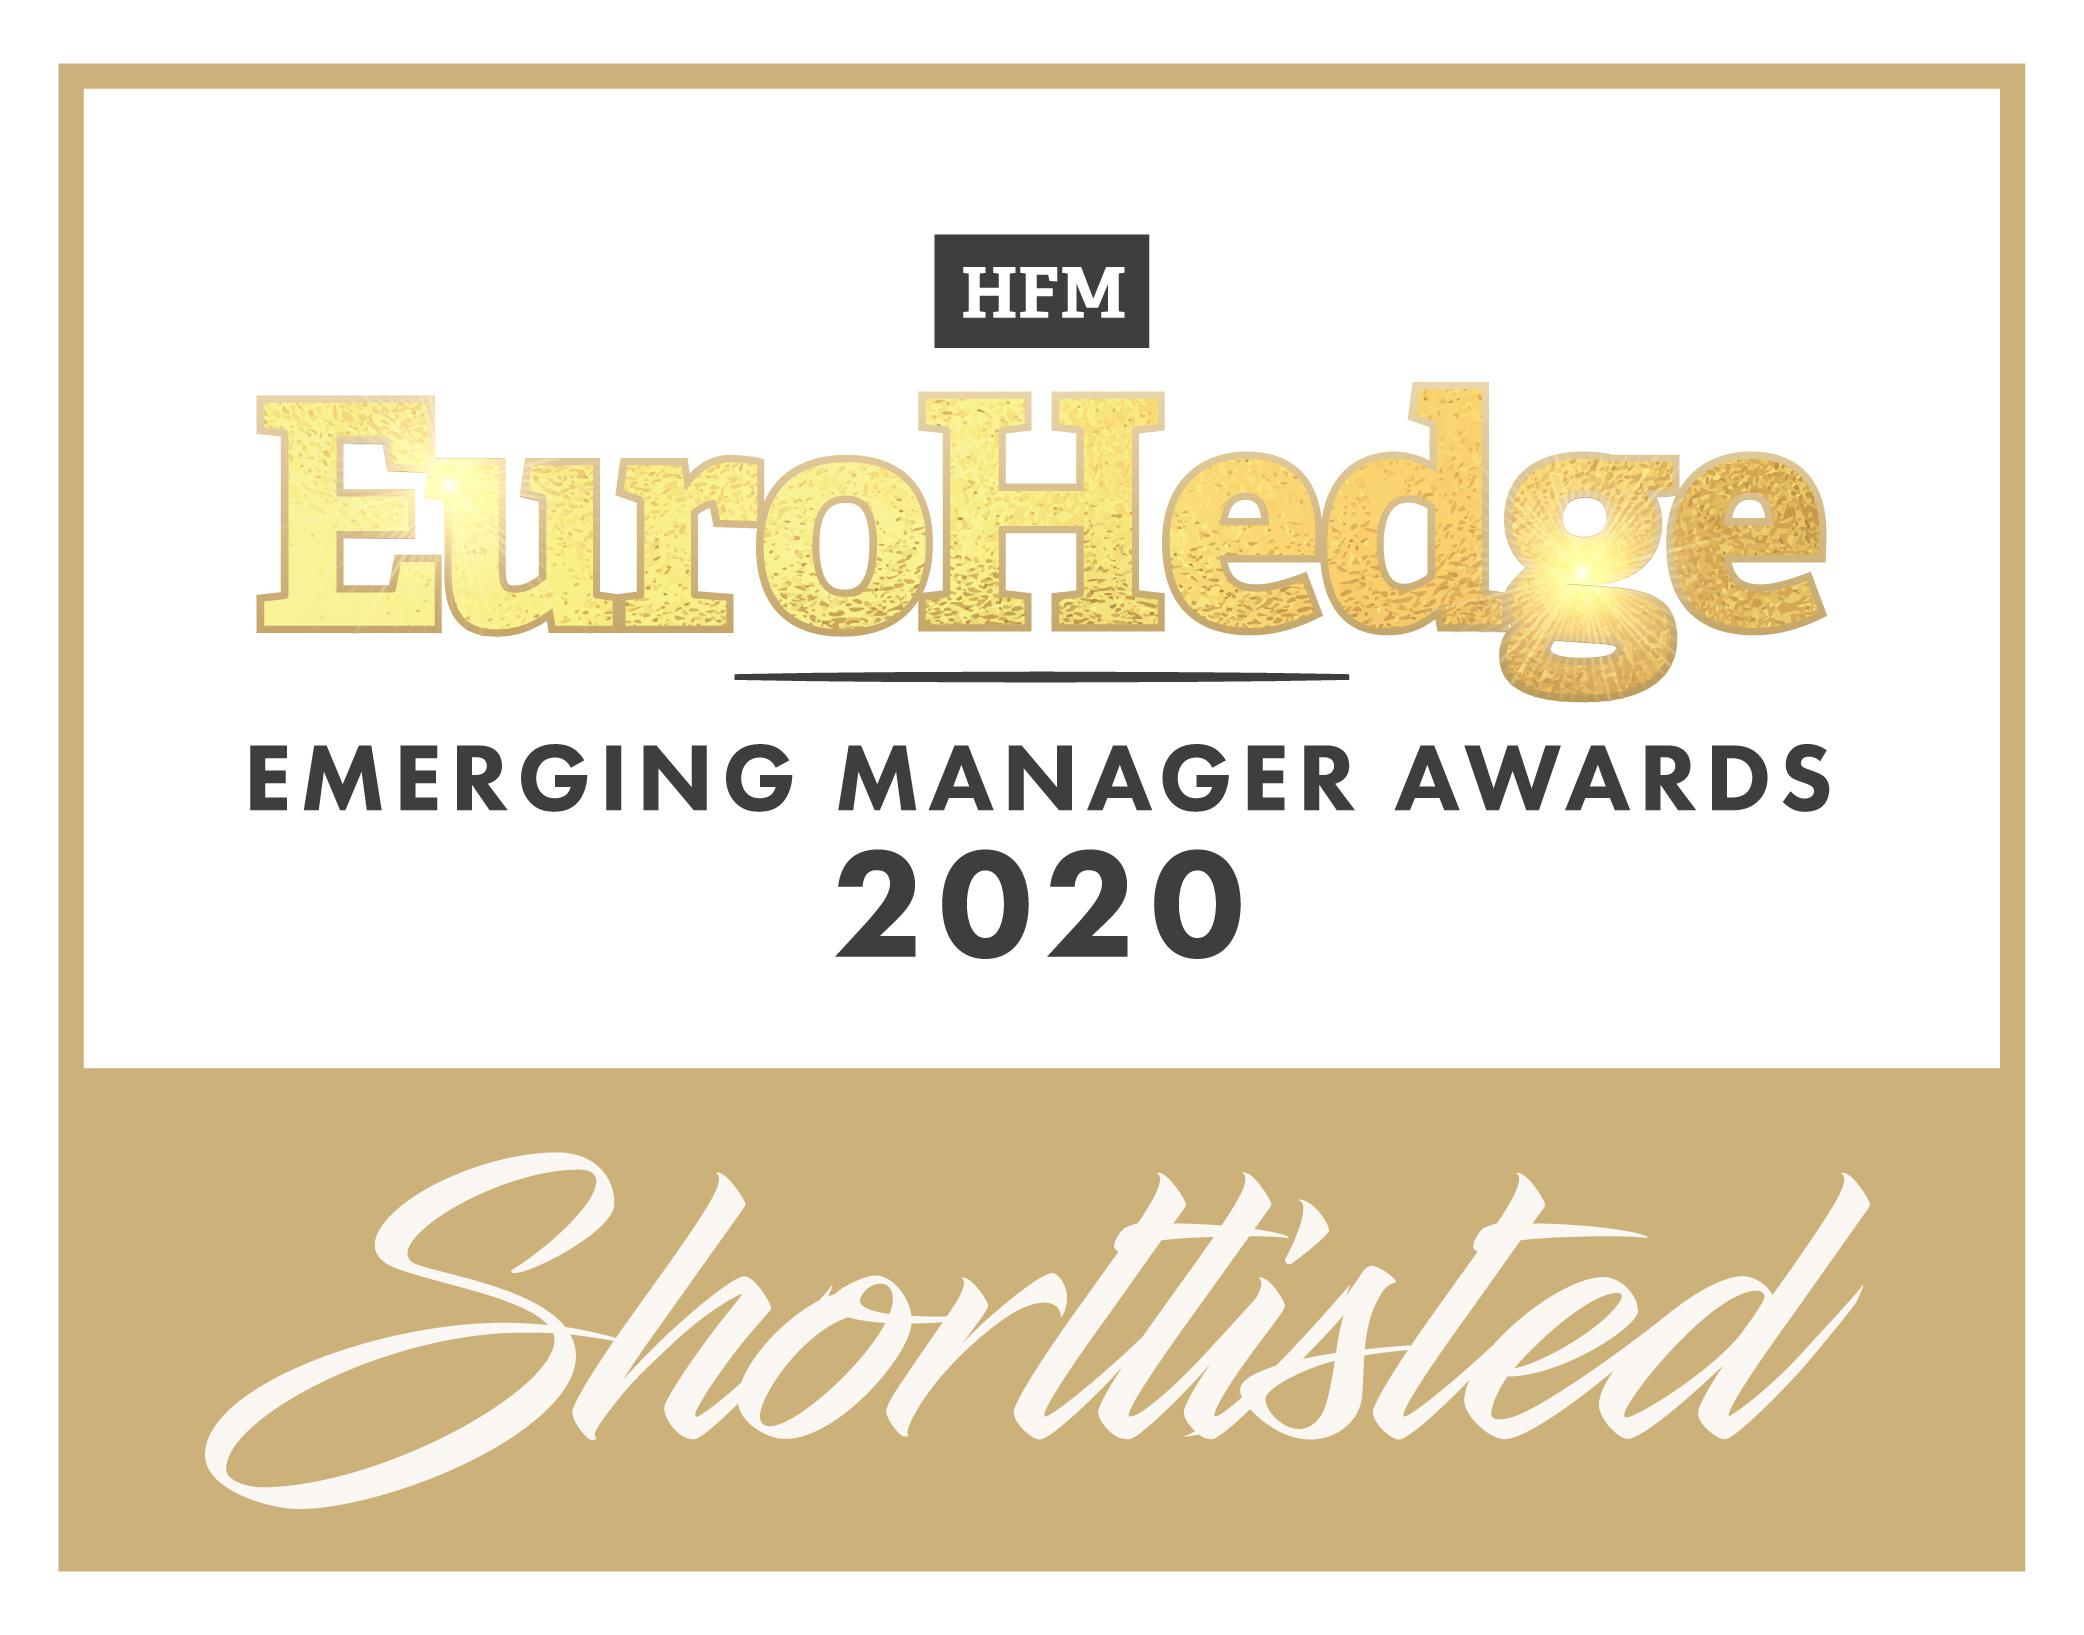 HFM European Emerging Manager Awards_WinnerLogos_Shortlisted